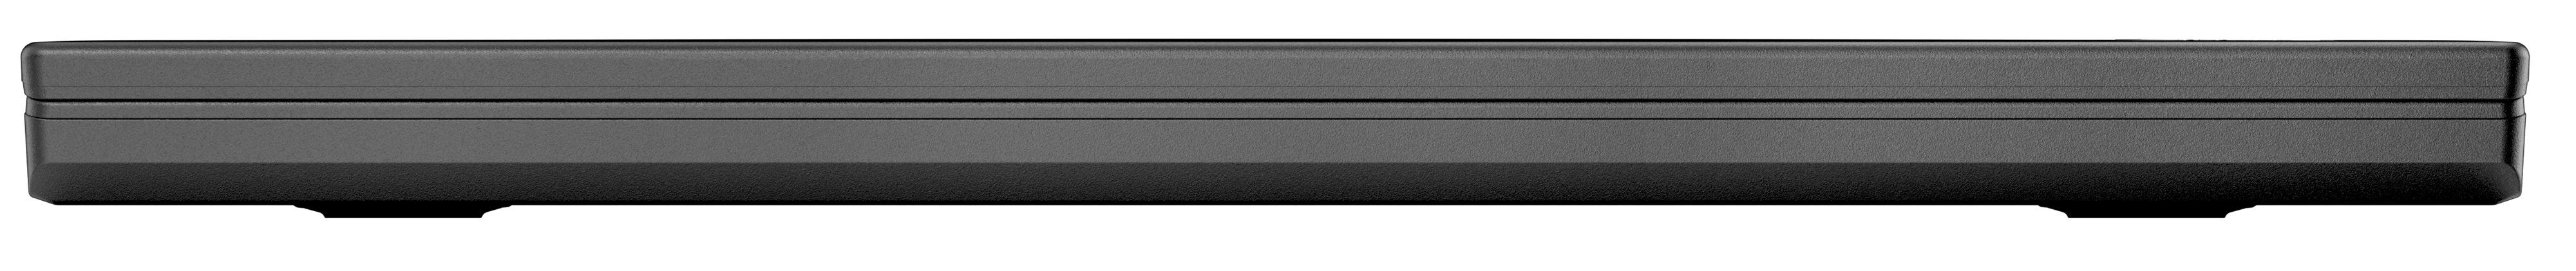 Фото  Ноутбук ThinkPad X270 (20HN005TRT)